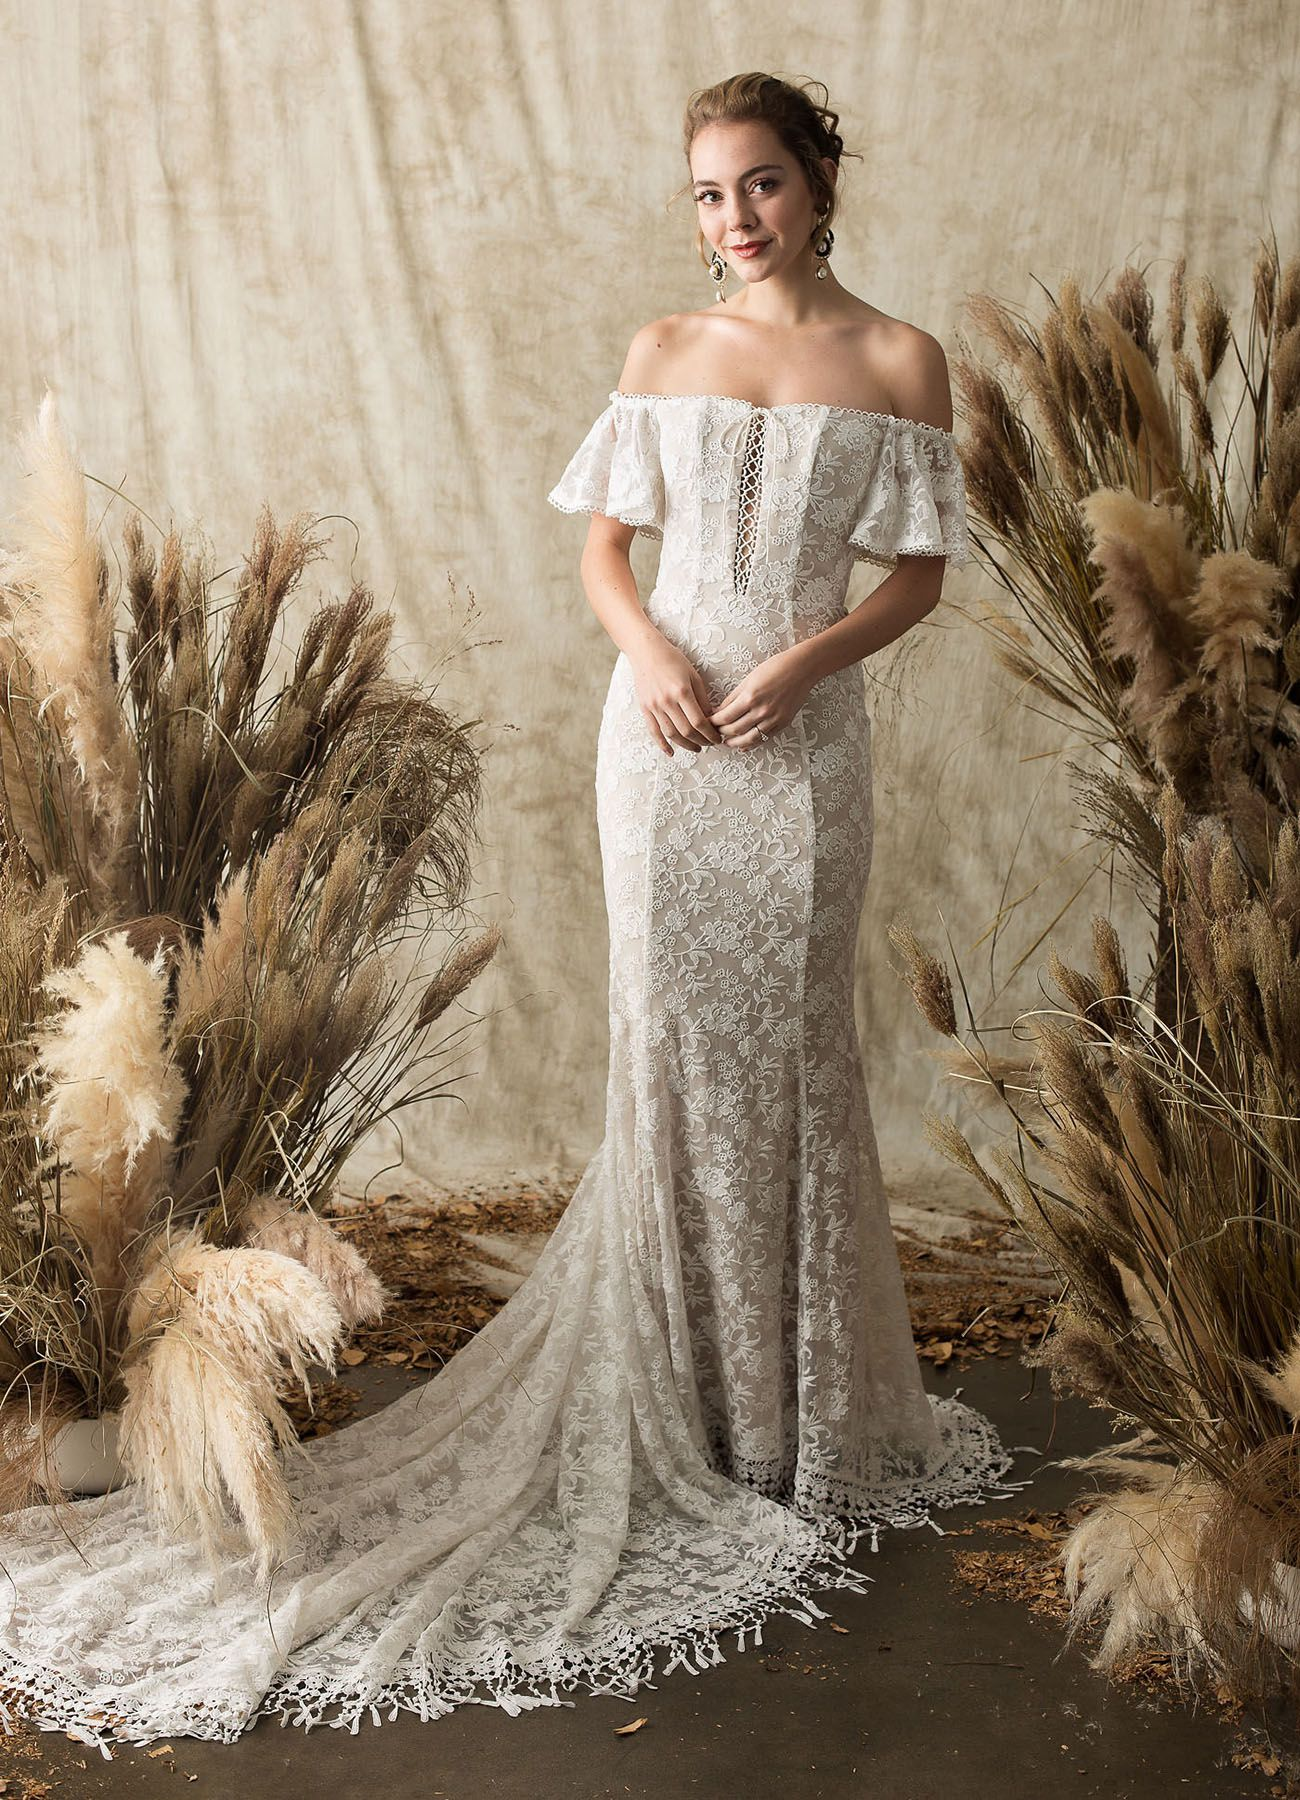 55cca15c458 Dreamers and Lovers boho lace wedding dress off the shoulder   laceweddingdress  bohoweddingdress